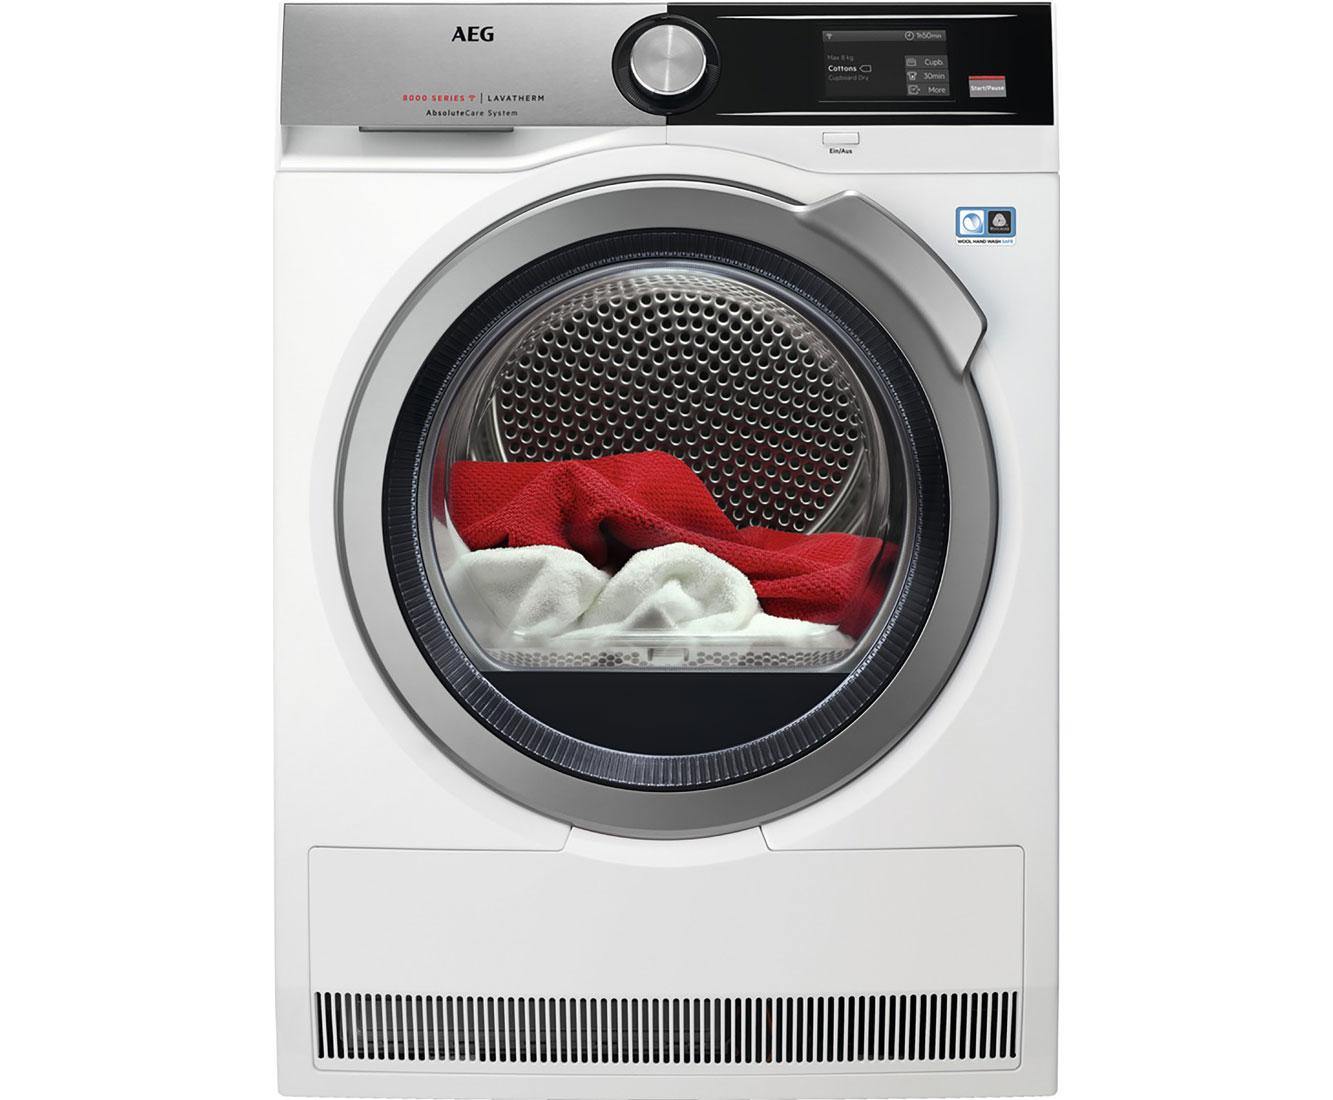 AEG T8DE96685 Wärmepumpentrockner - Weiss | Bad > Waschmaschinen und Trockner | Weiss | AEG